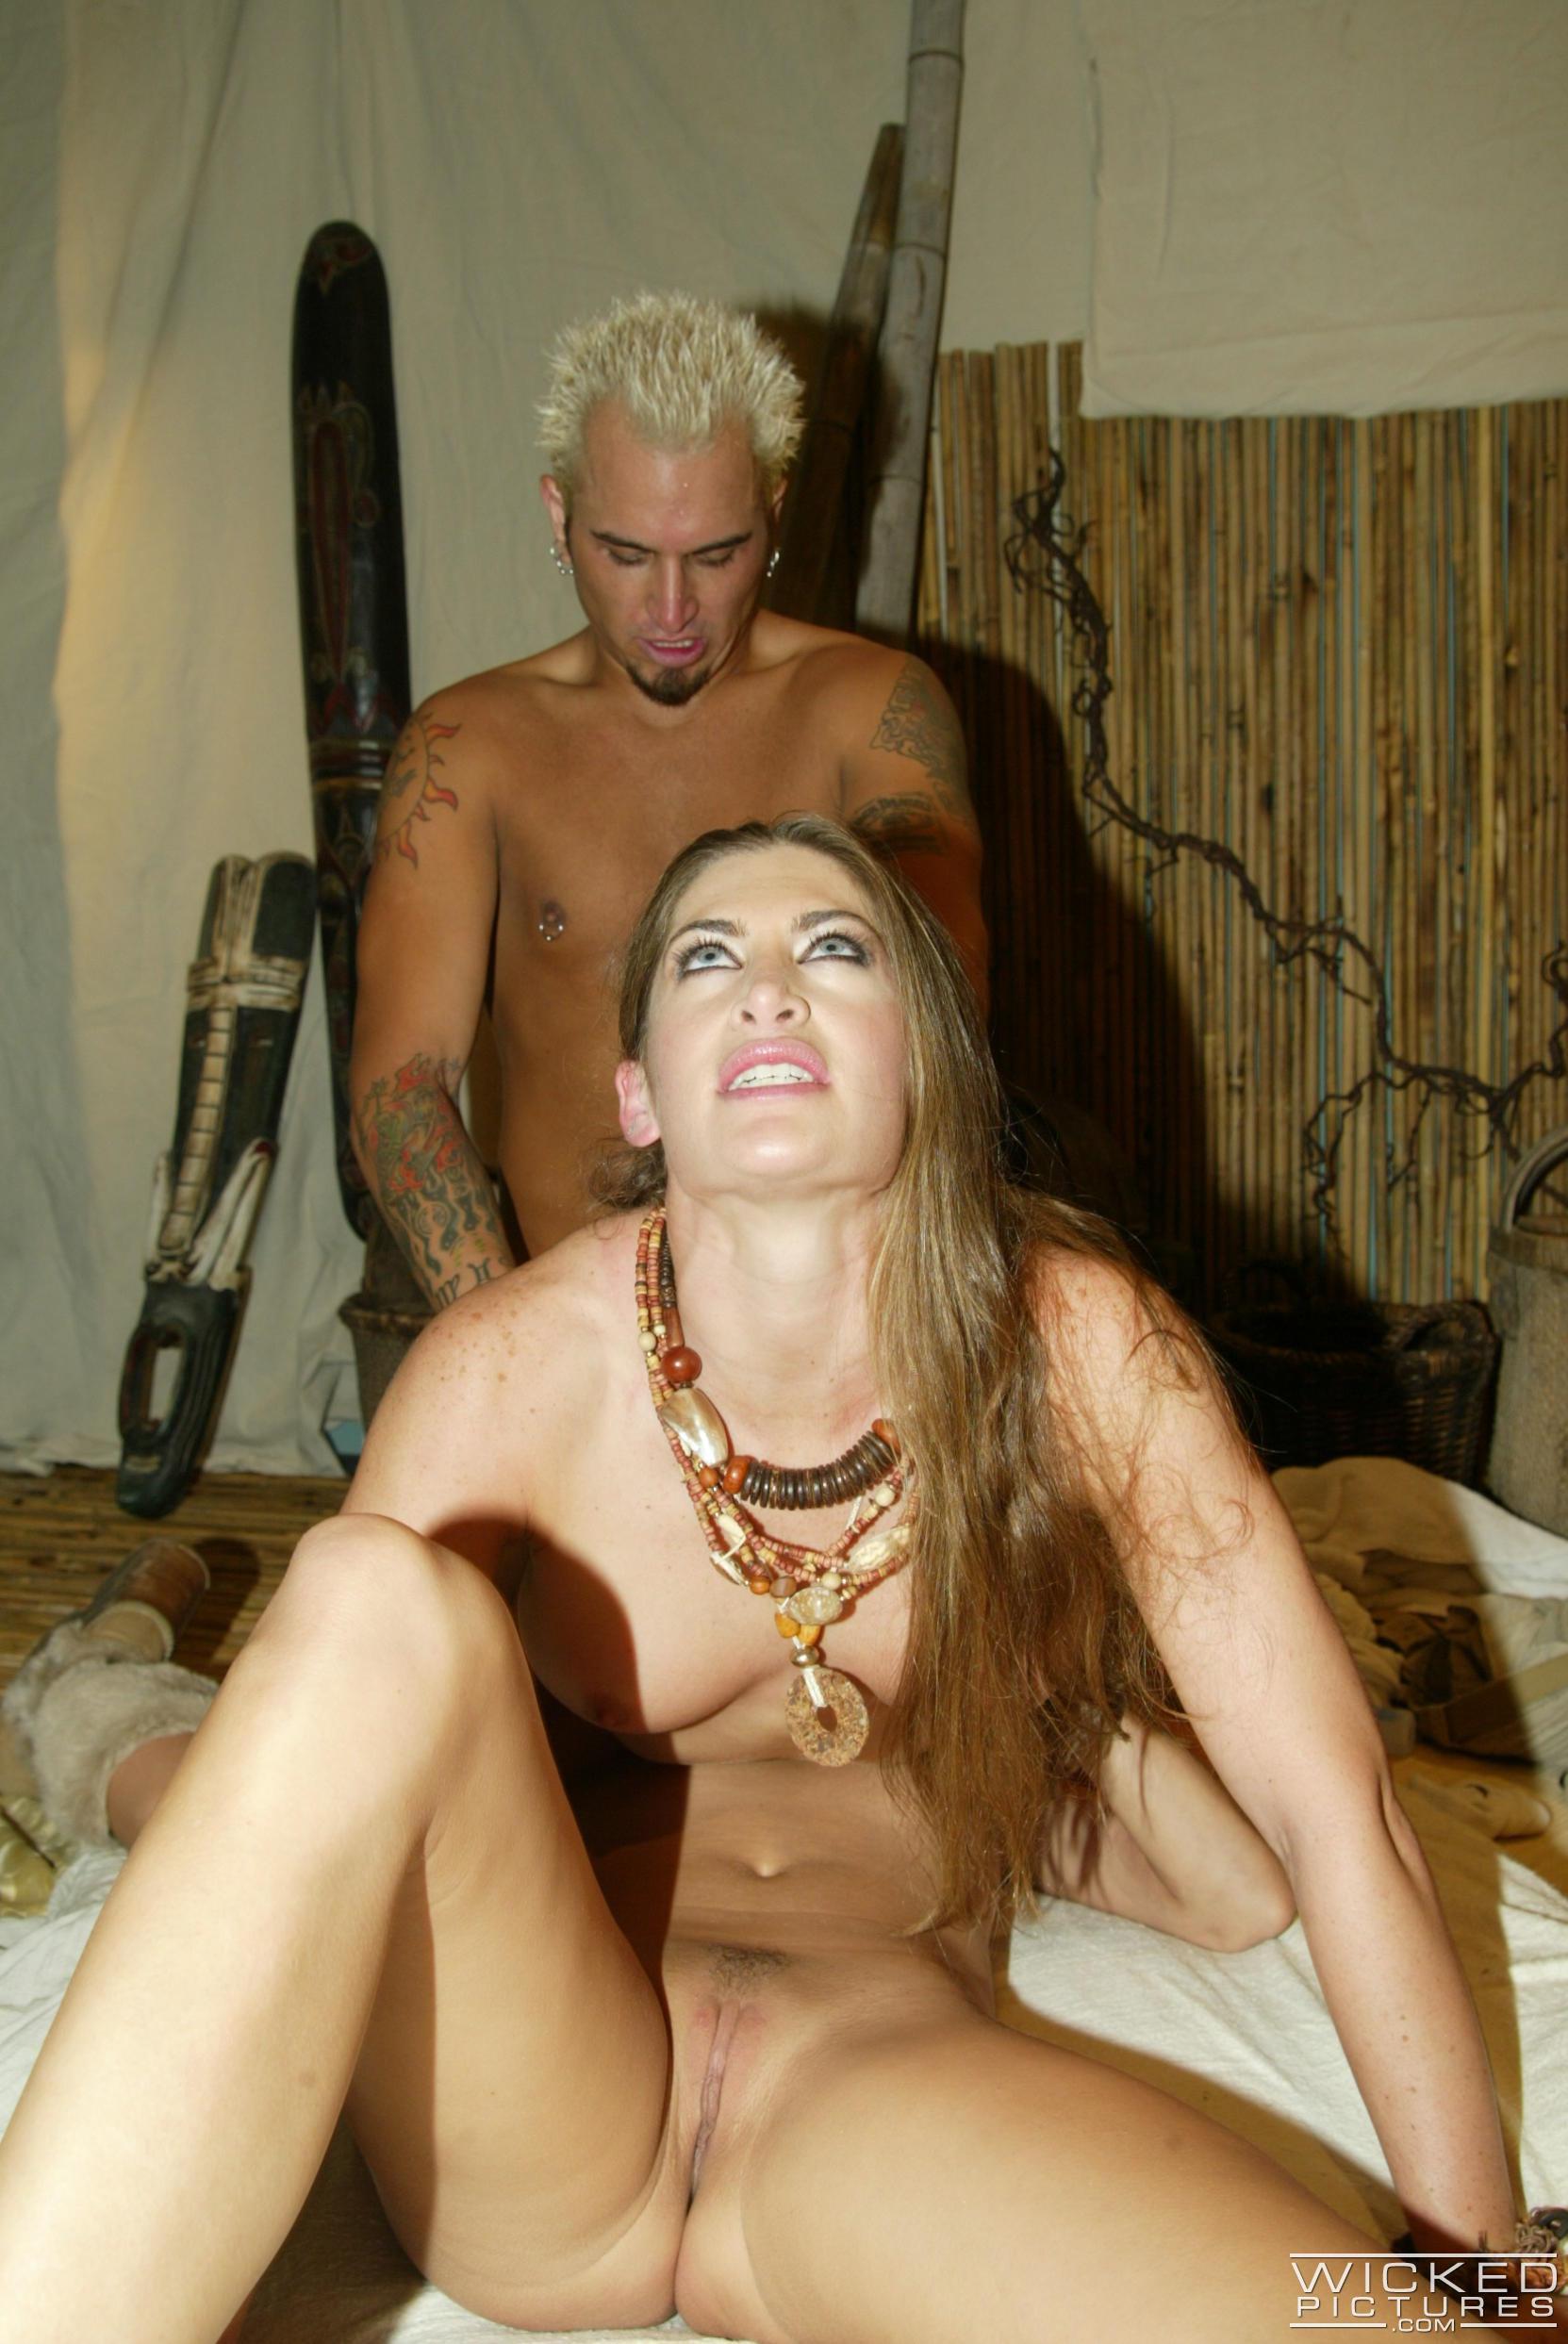 Wicked 'Porn Star Scene 1' starring Aria (Photo 89)